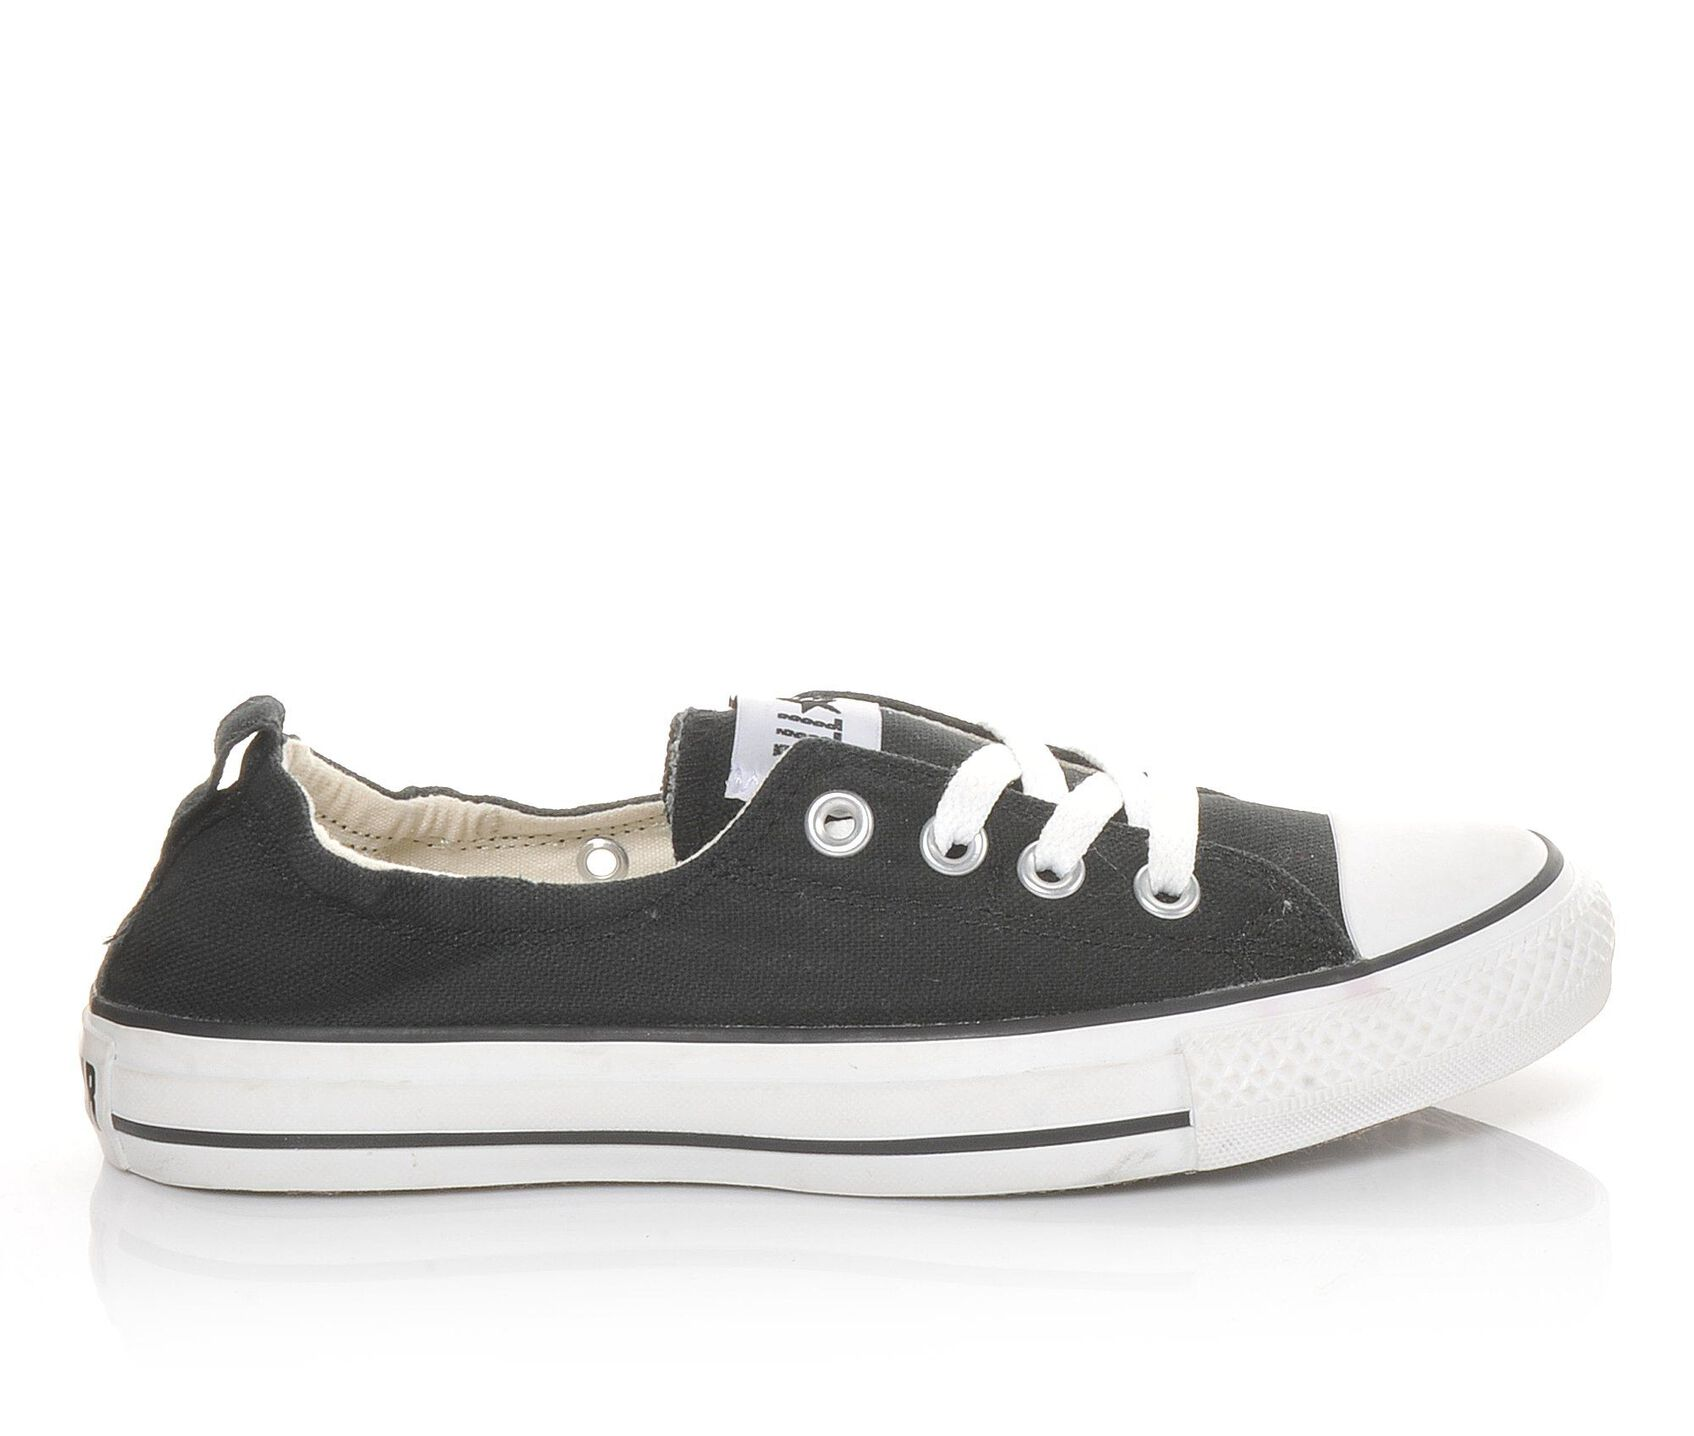 73295ad7c931 Women s Converse Chuck Taylor Shoreline Sneakers